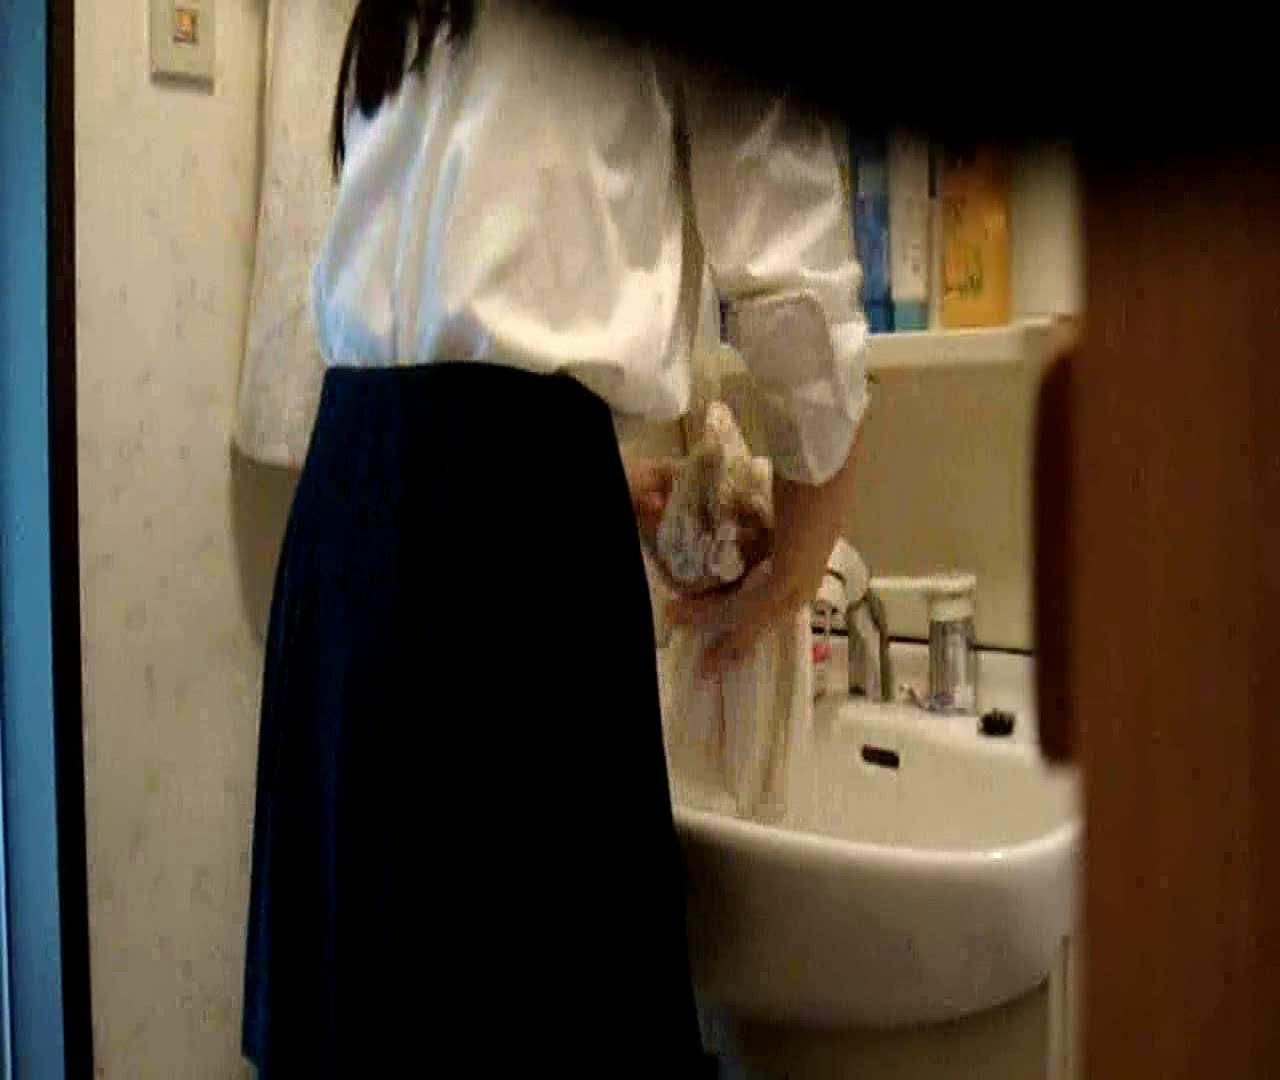 vol.5 まどかが帰宅後の洗顔後にブラを洗ってます。 ギャル達 | 民家  112枚 89